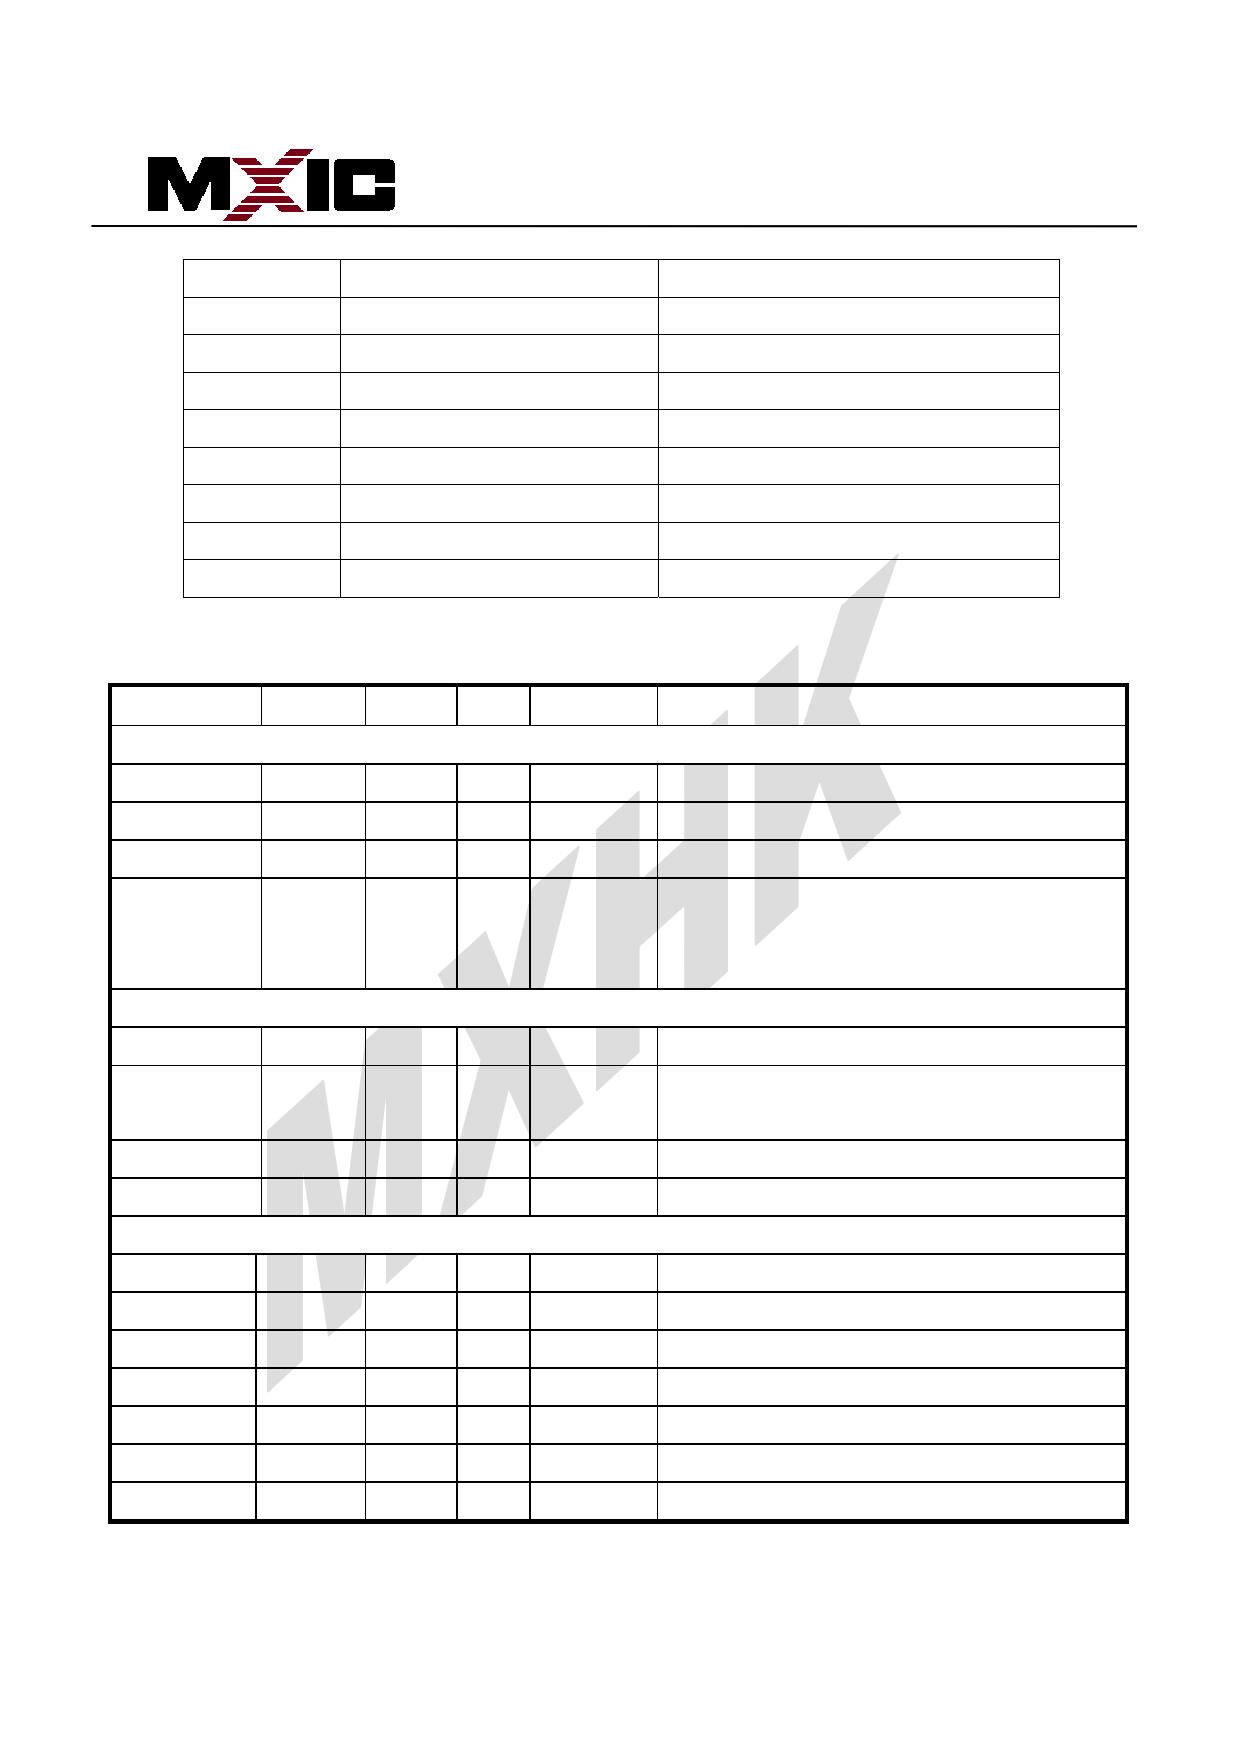 MX88V44 Datasheet, Funktion